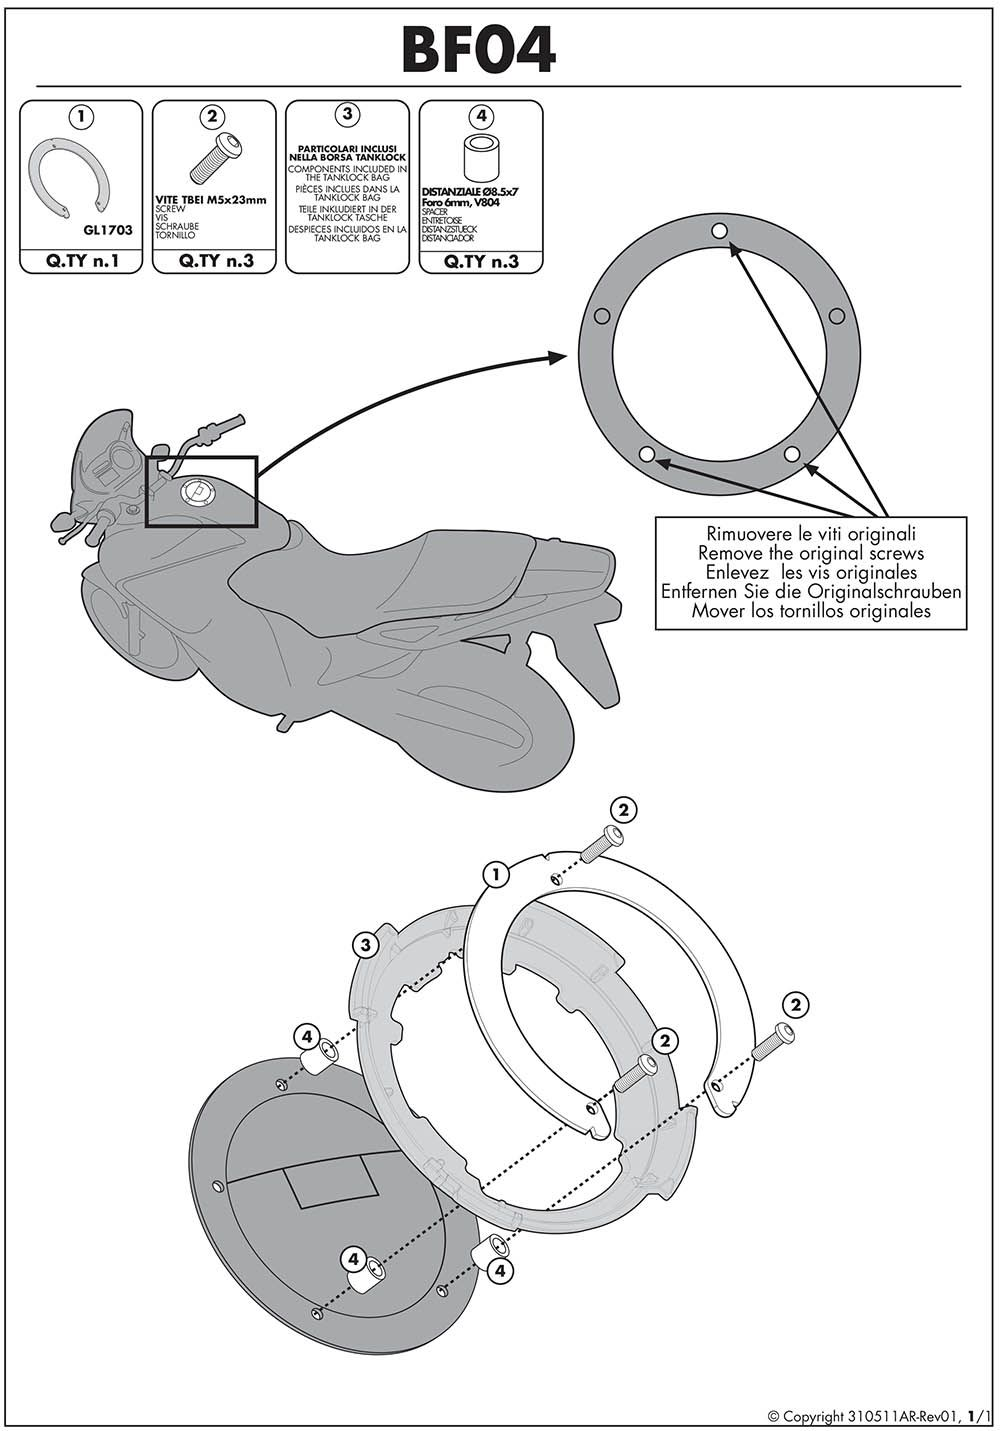 Flange Fixação Bolsas Tanque Tanklock Kawasaki Bf04 Givi